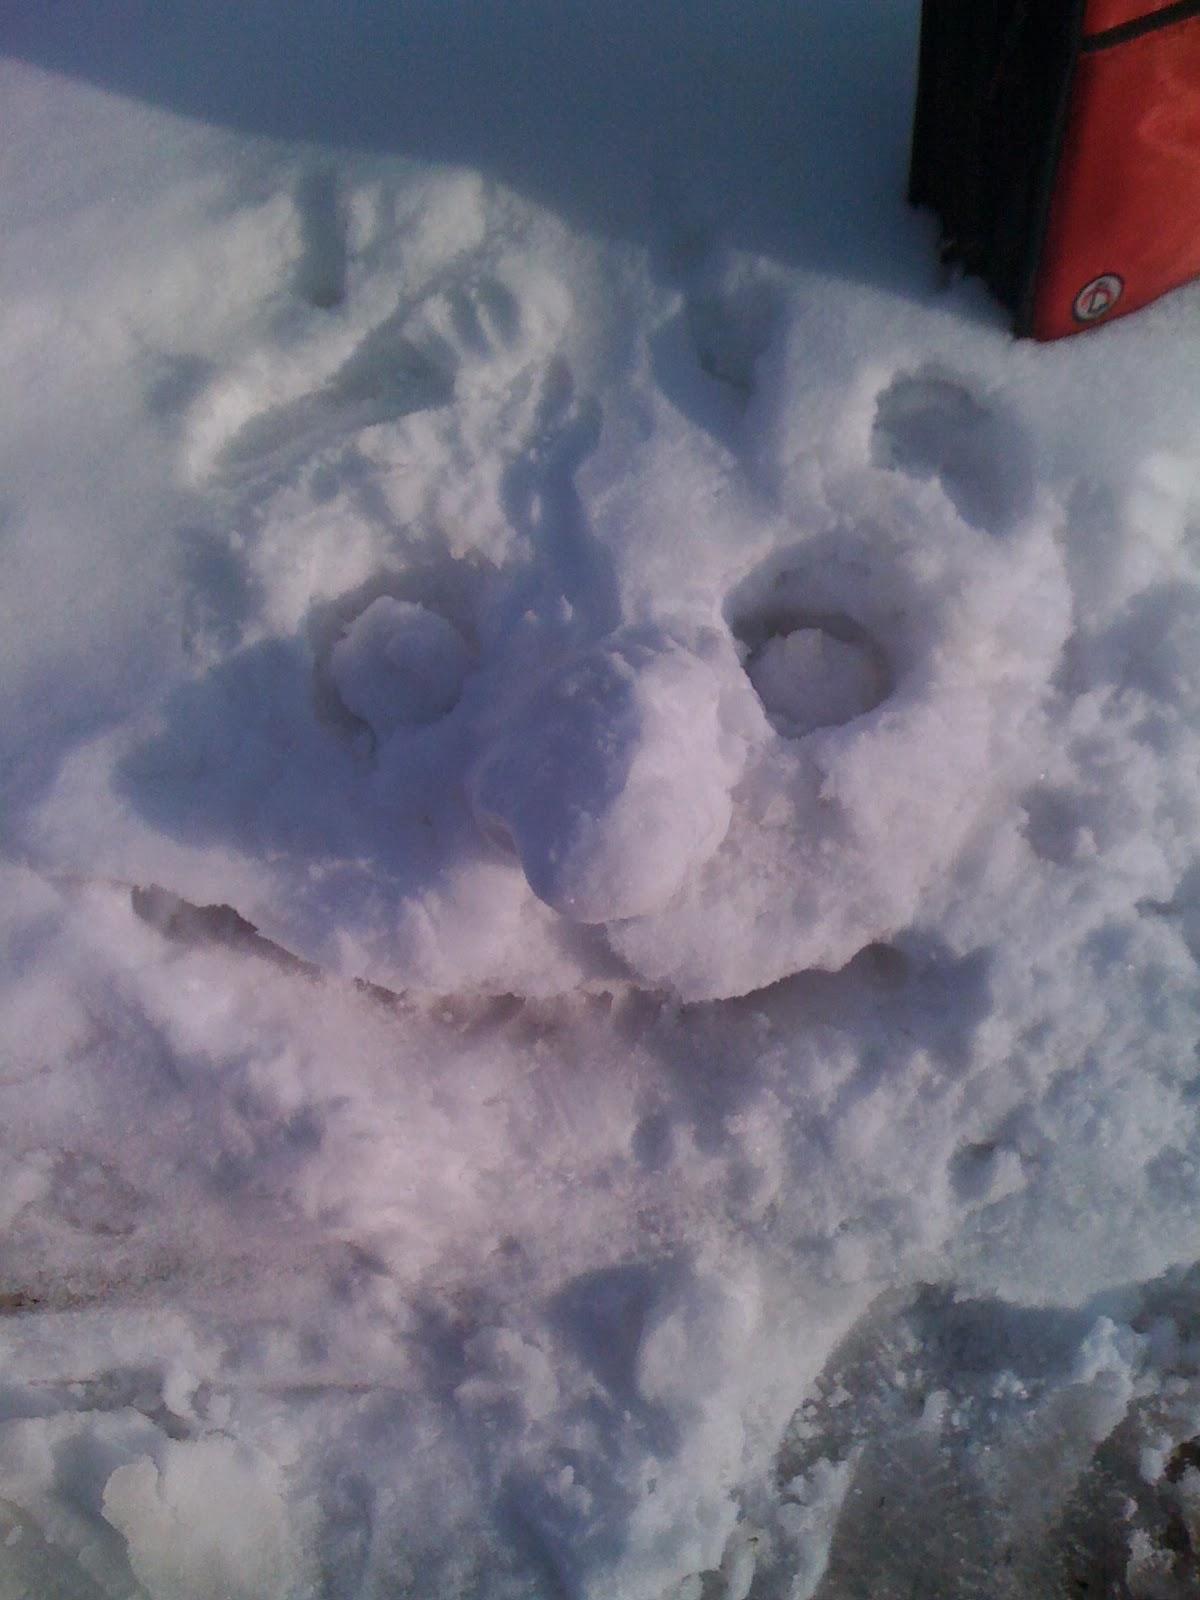 Snow man face